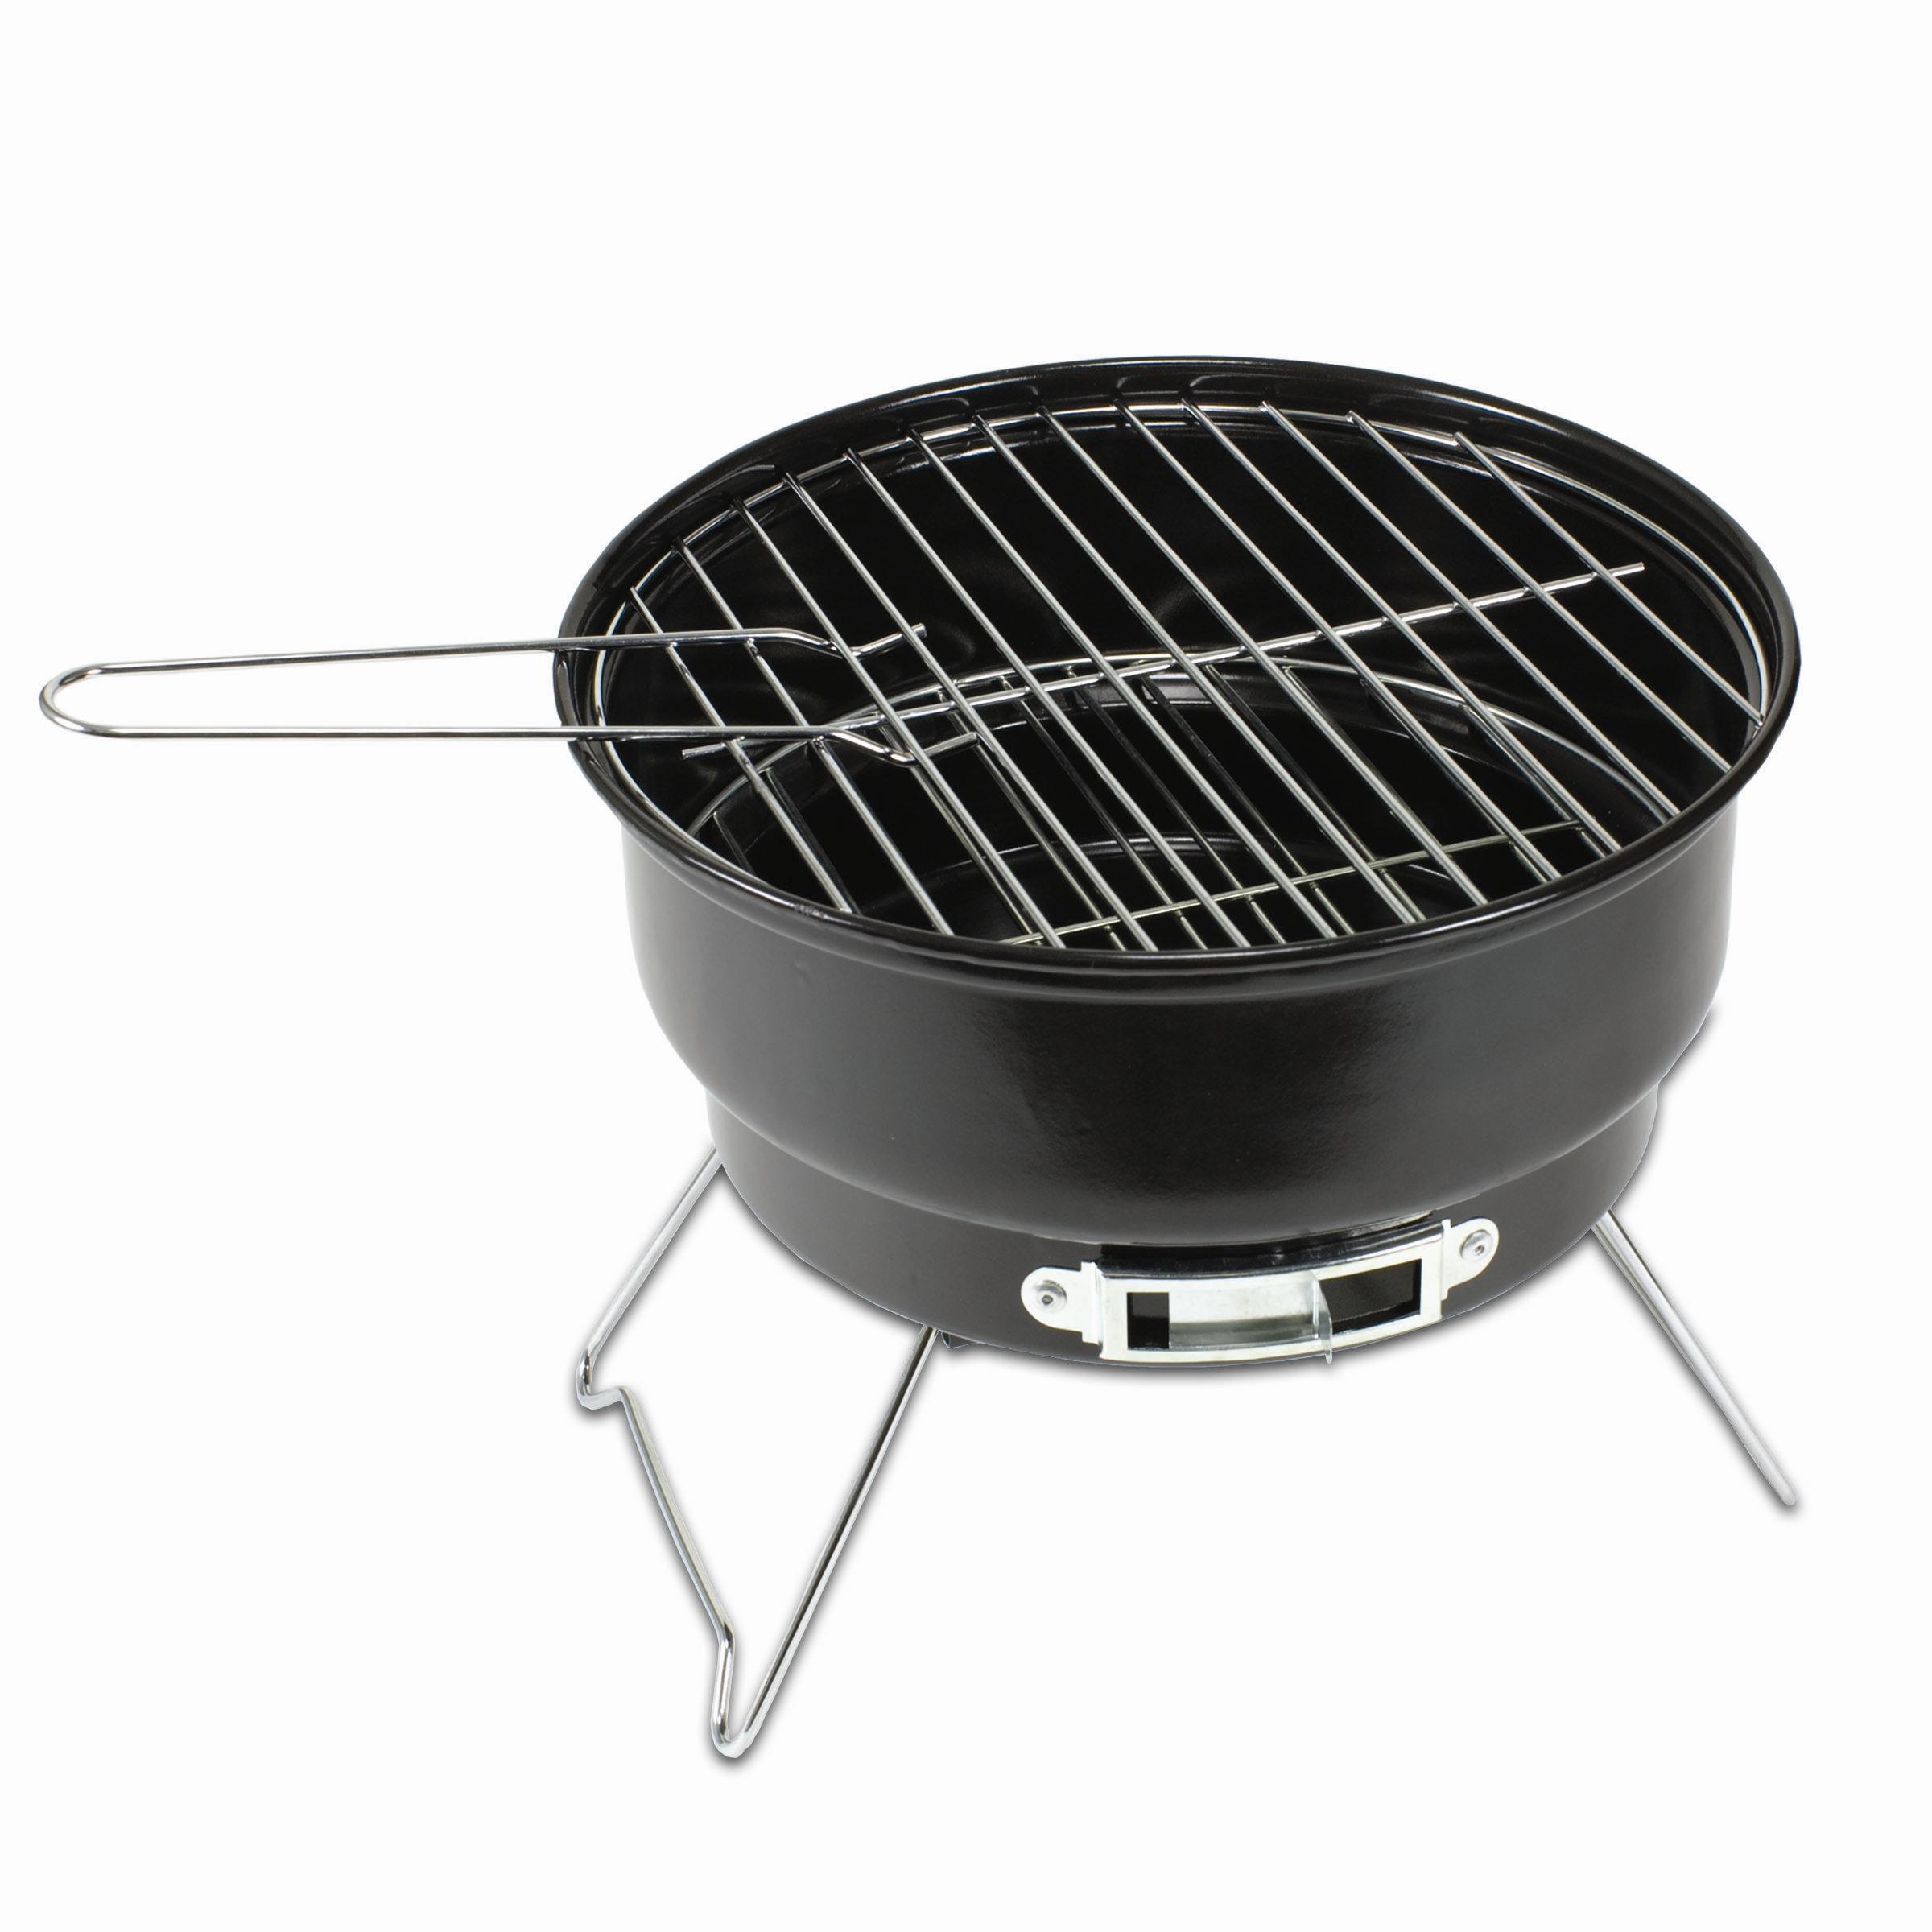 Merveilleux Caliente Portable Charcoal BBQ Grill